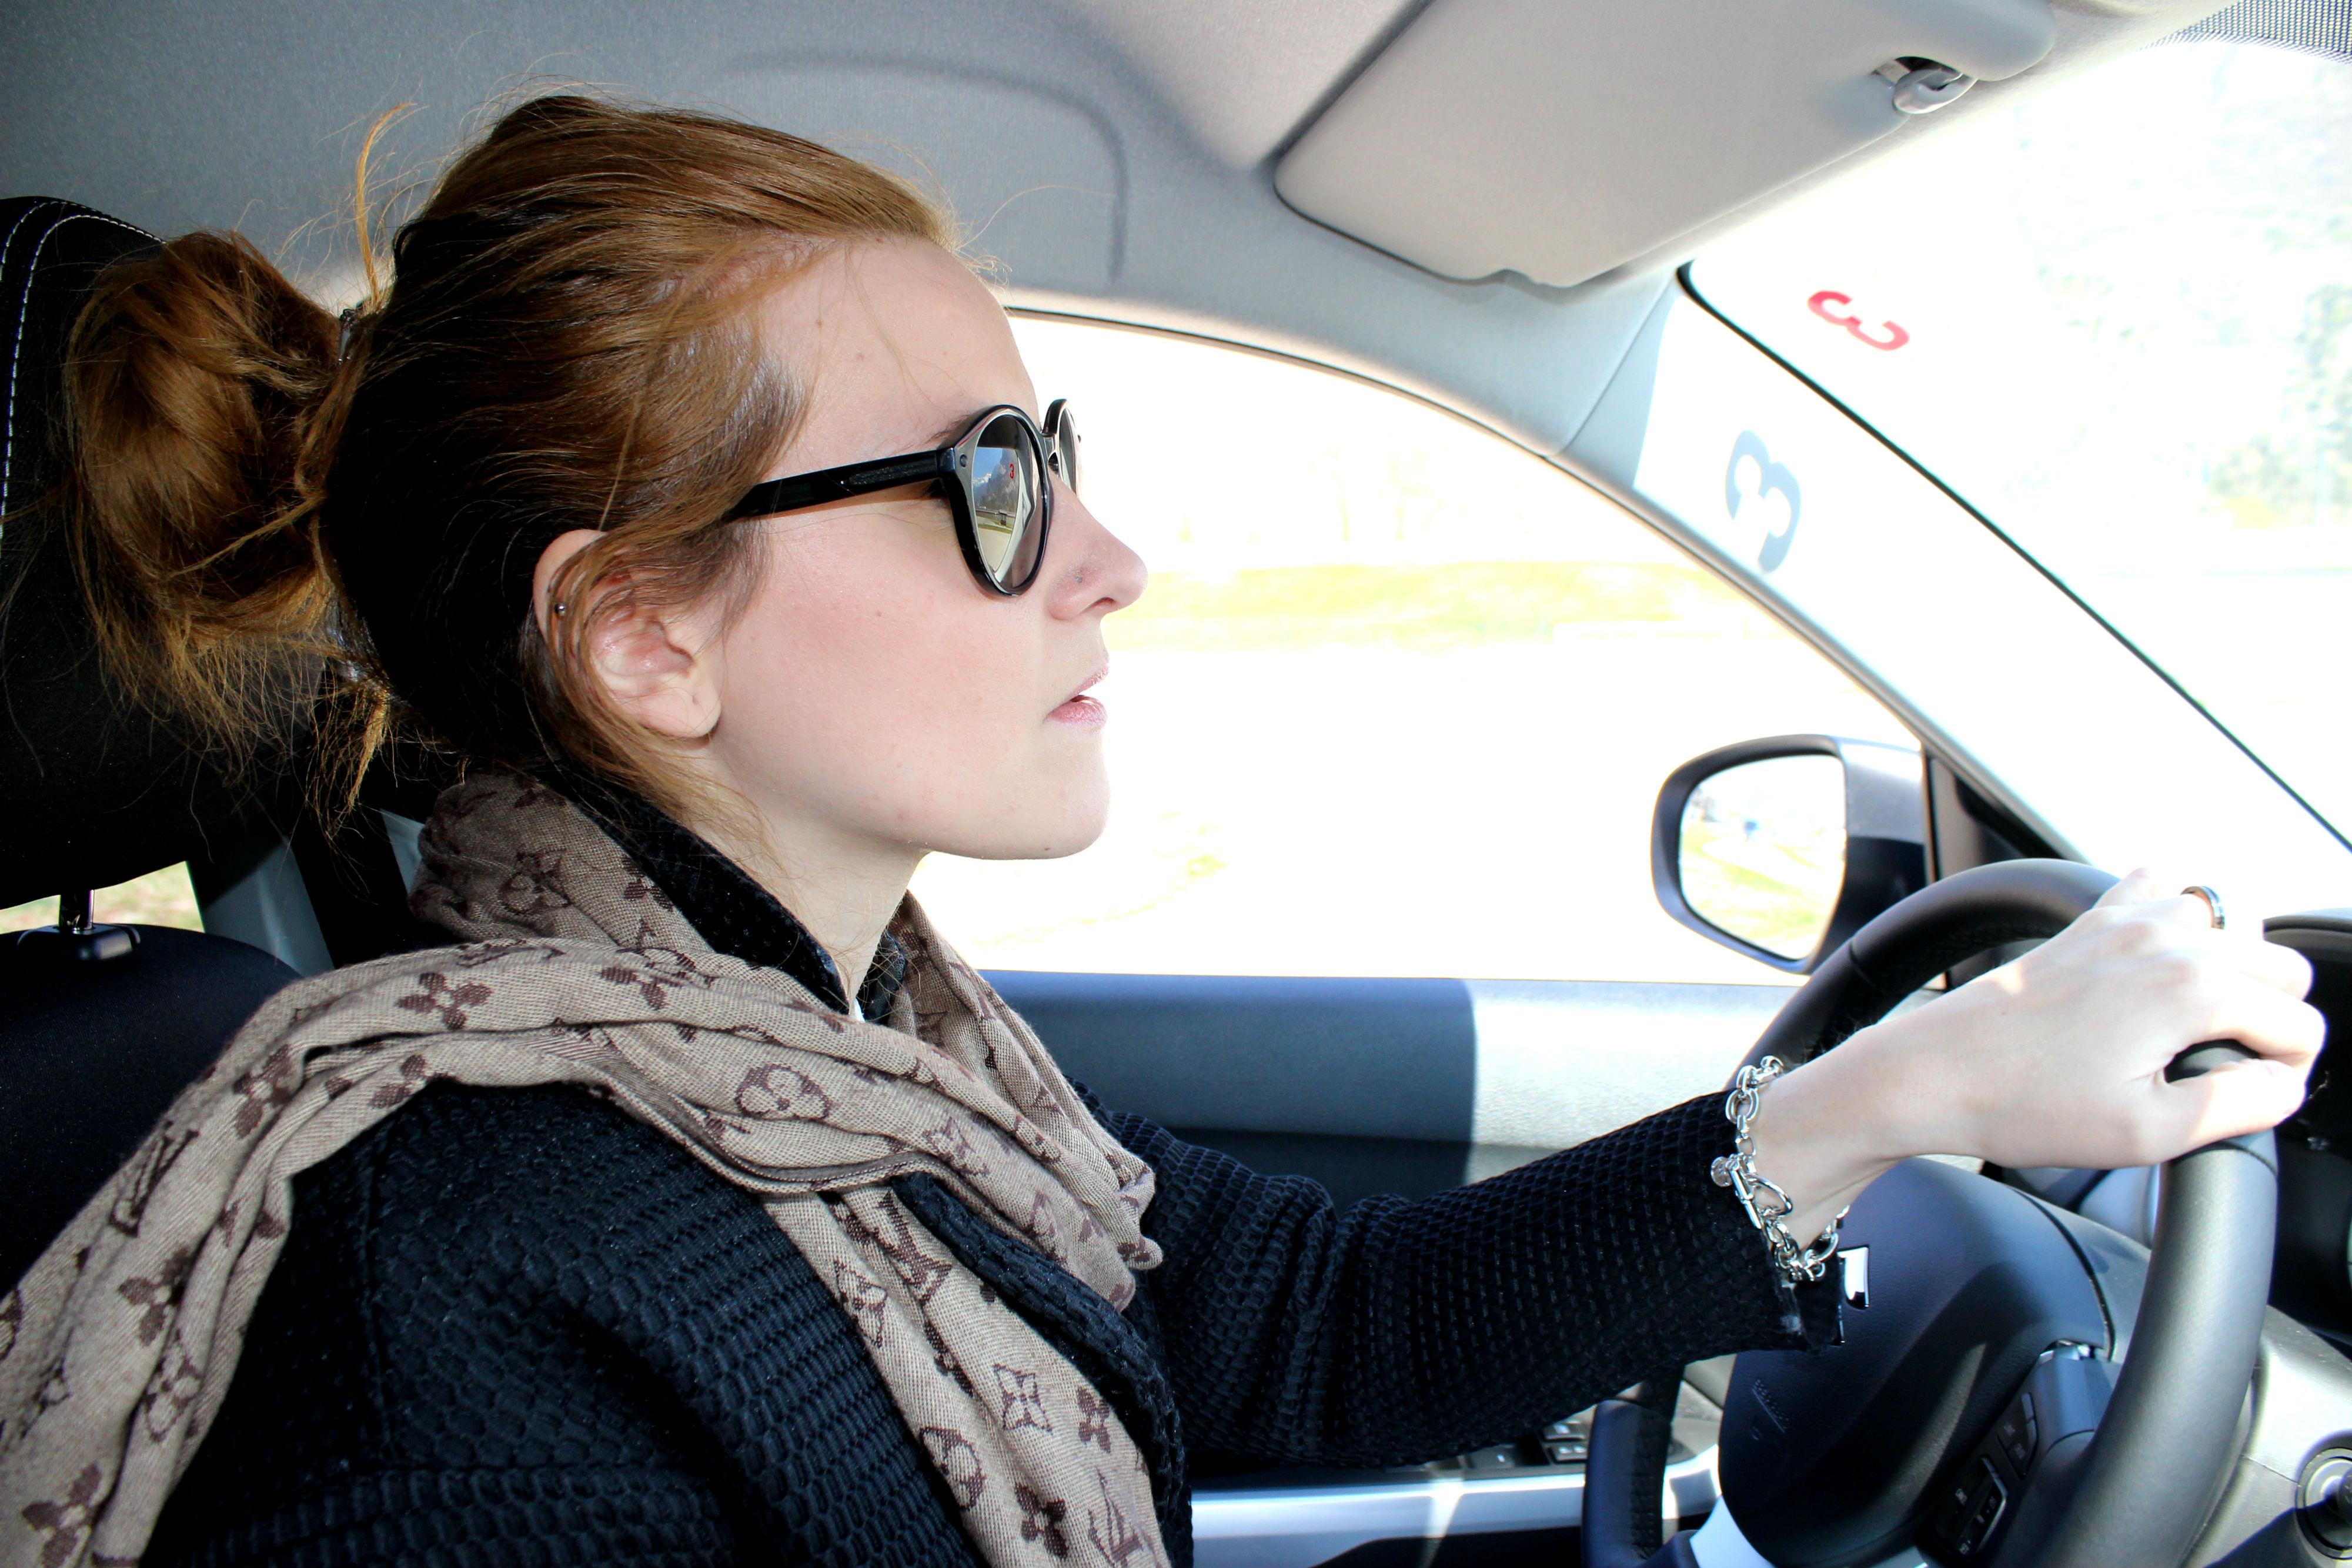 test-drive-automotive-gran-vitara-suzuki-elisabettabertolini8